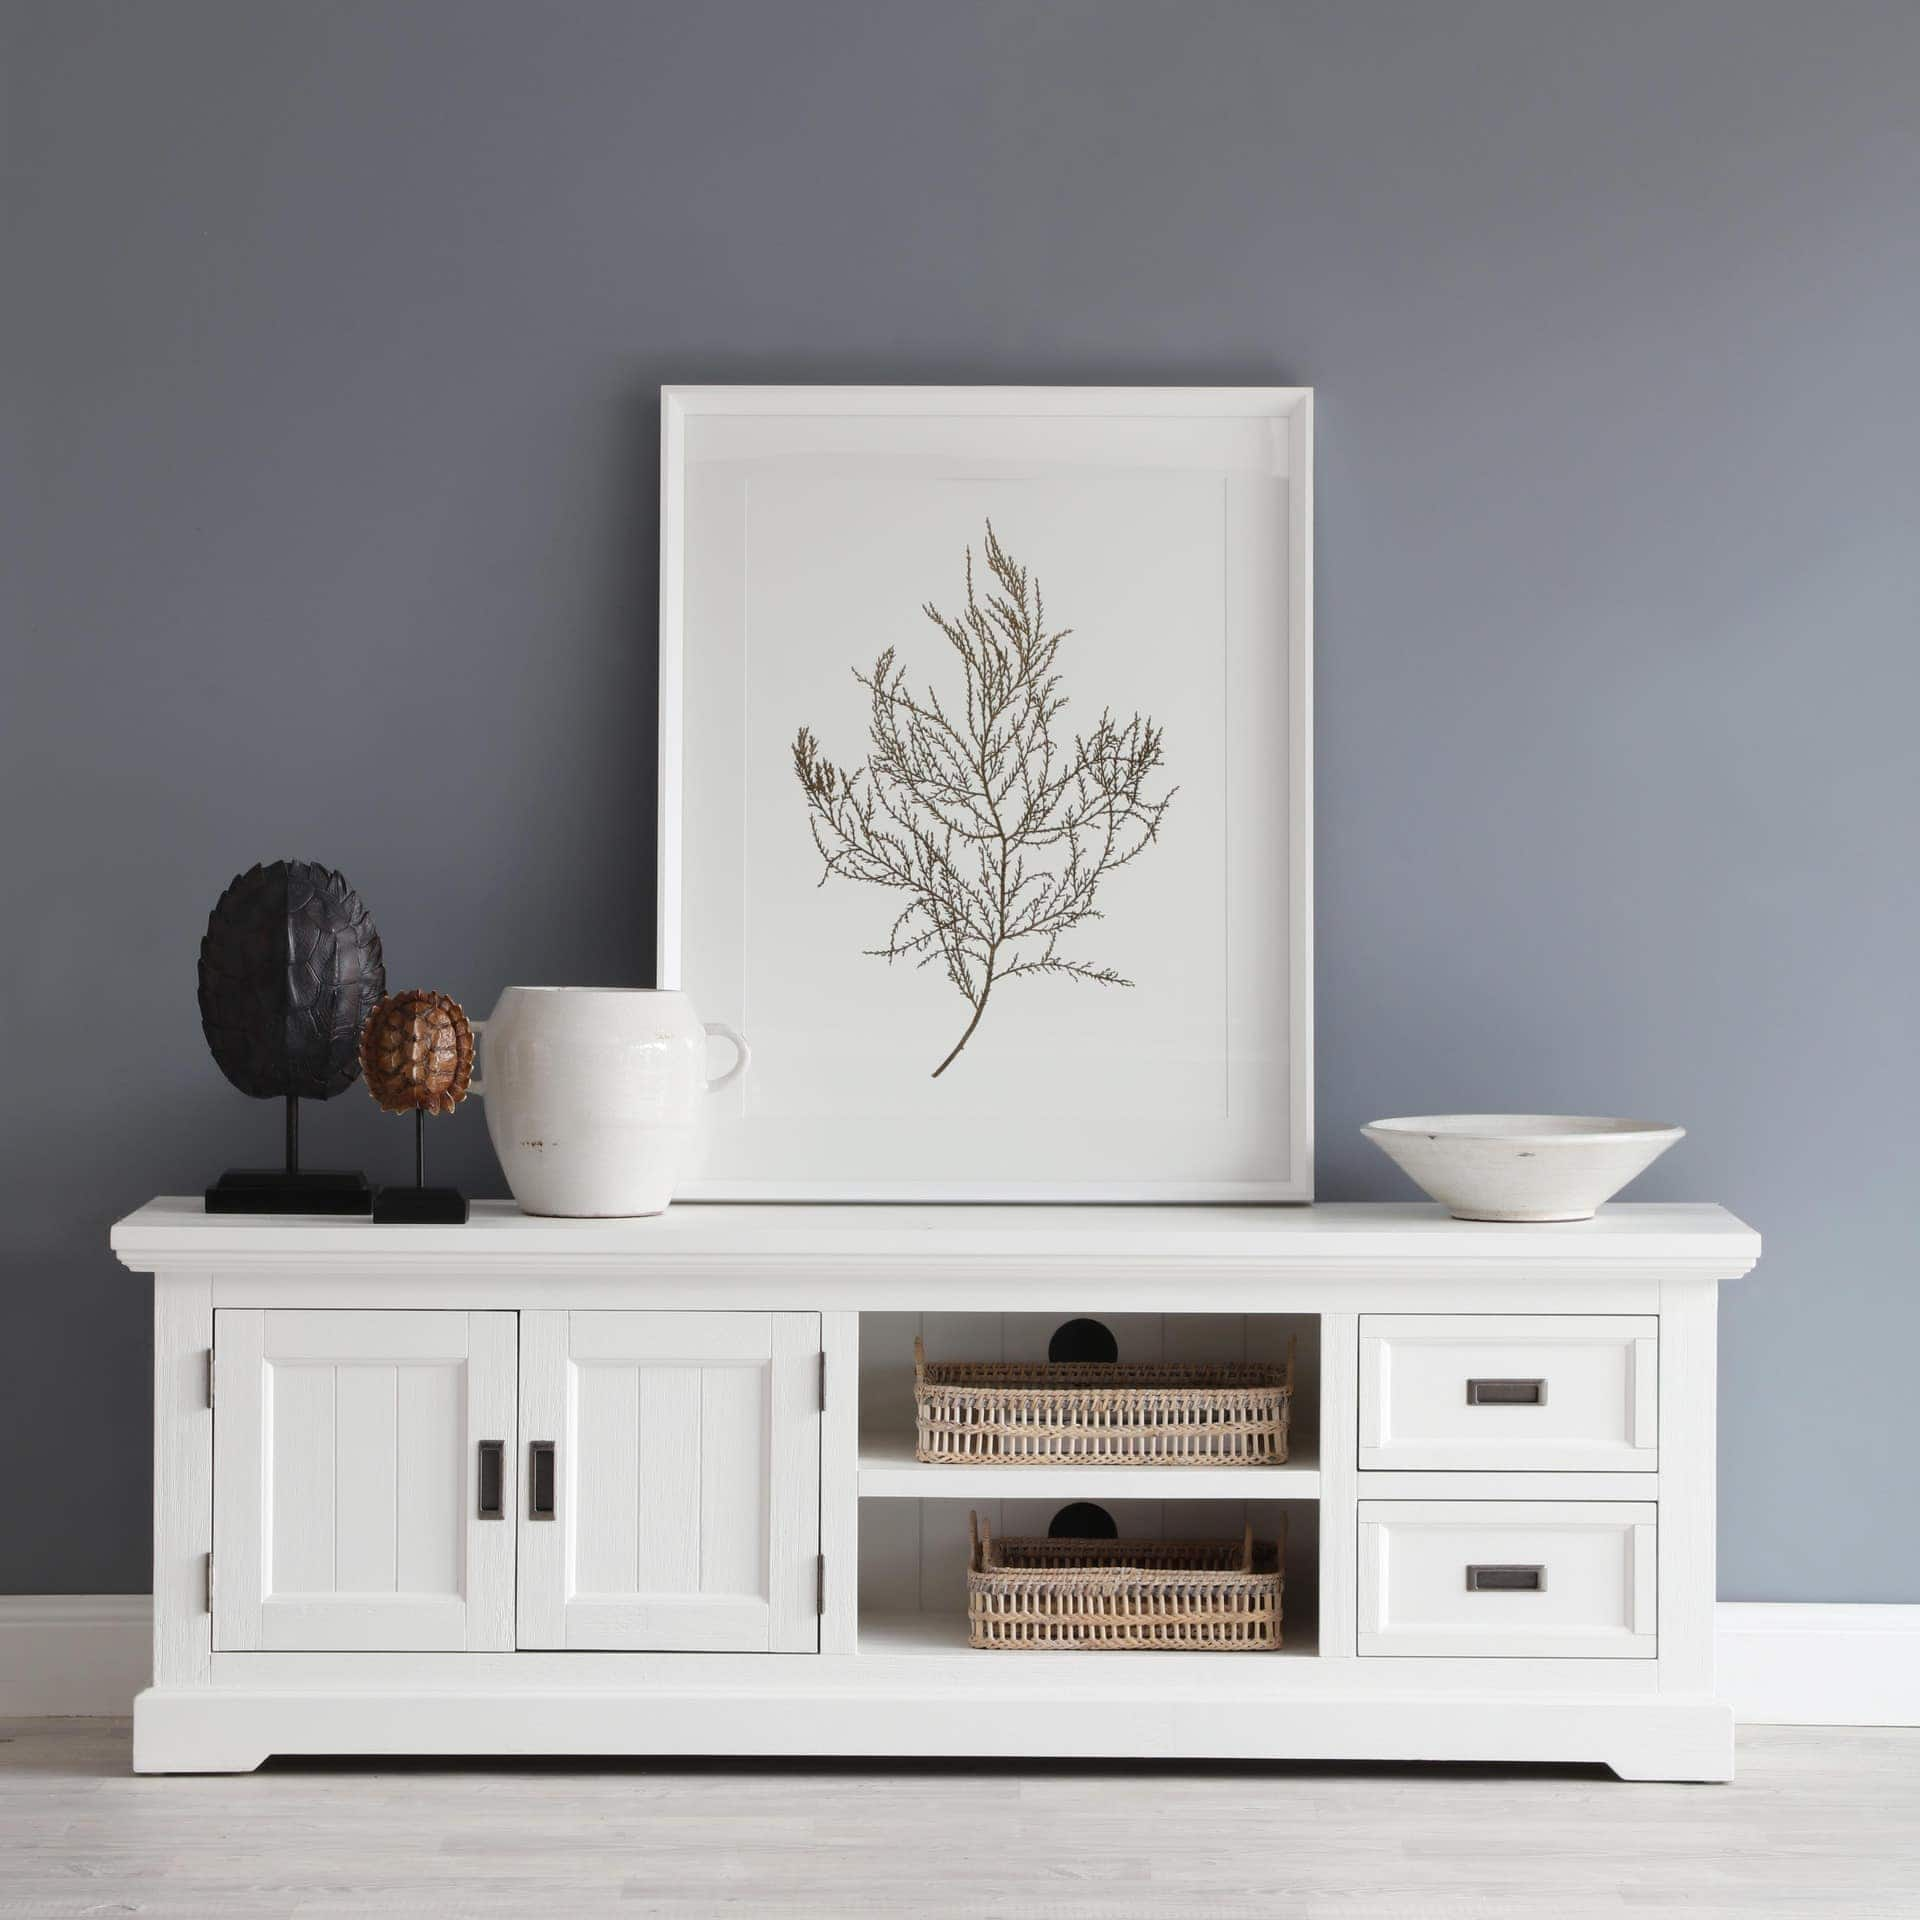 Hamptons furniture and homewares australia Entertainment Unit from oz design